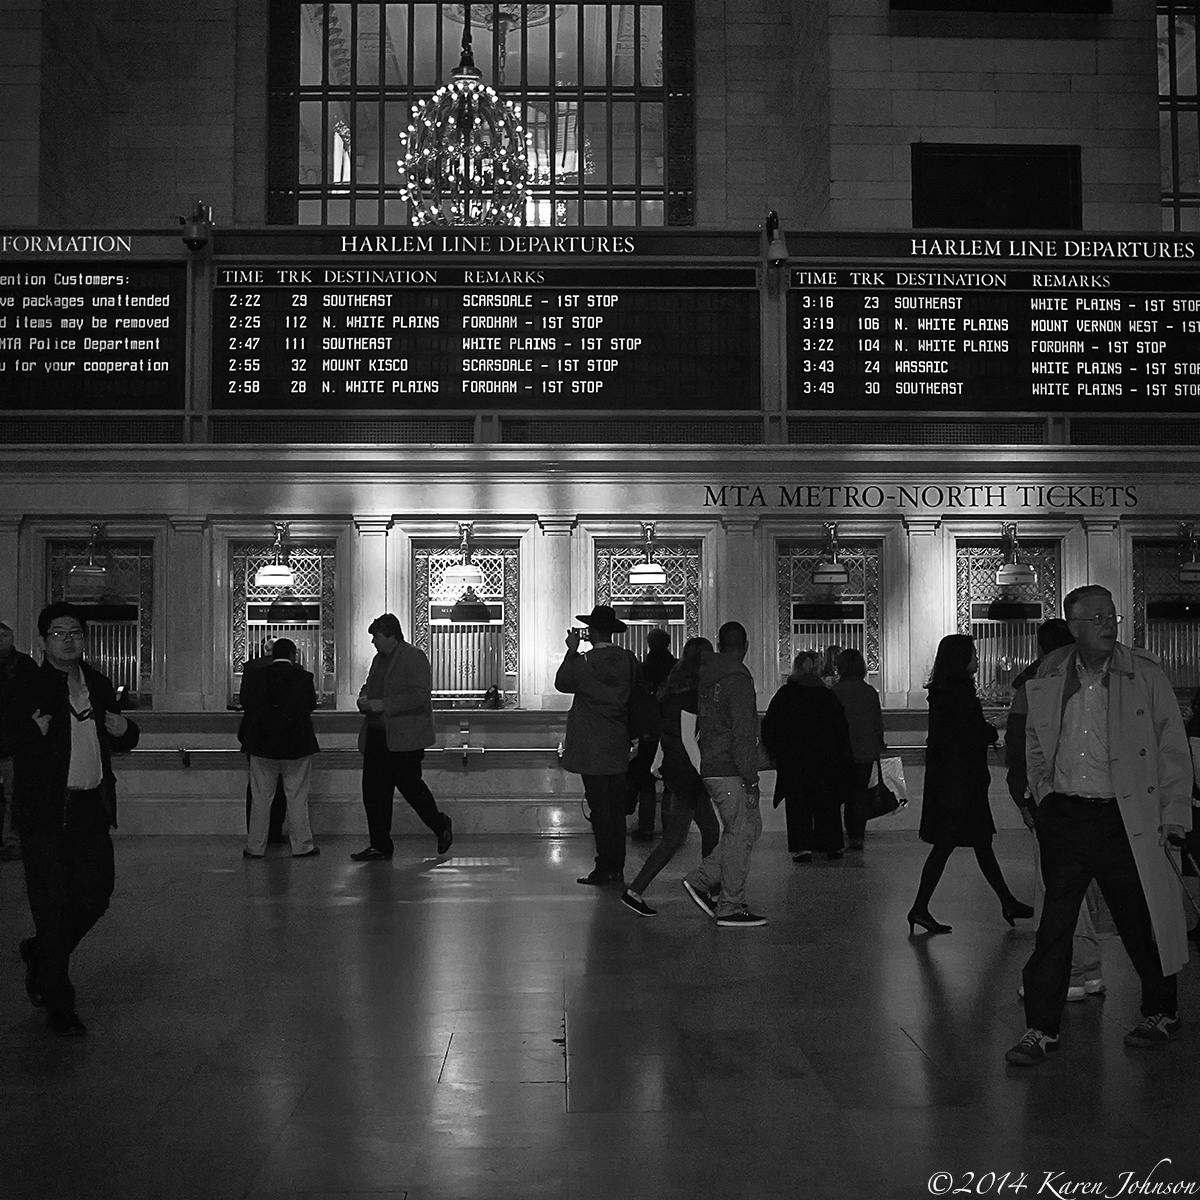 Grand central station karen johnson a photographic life